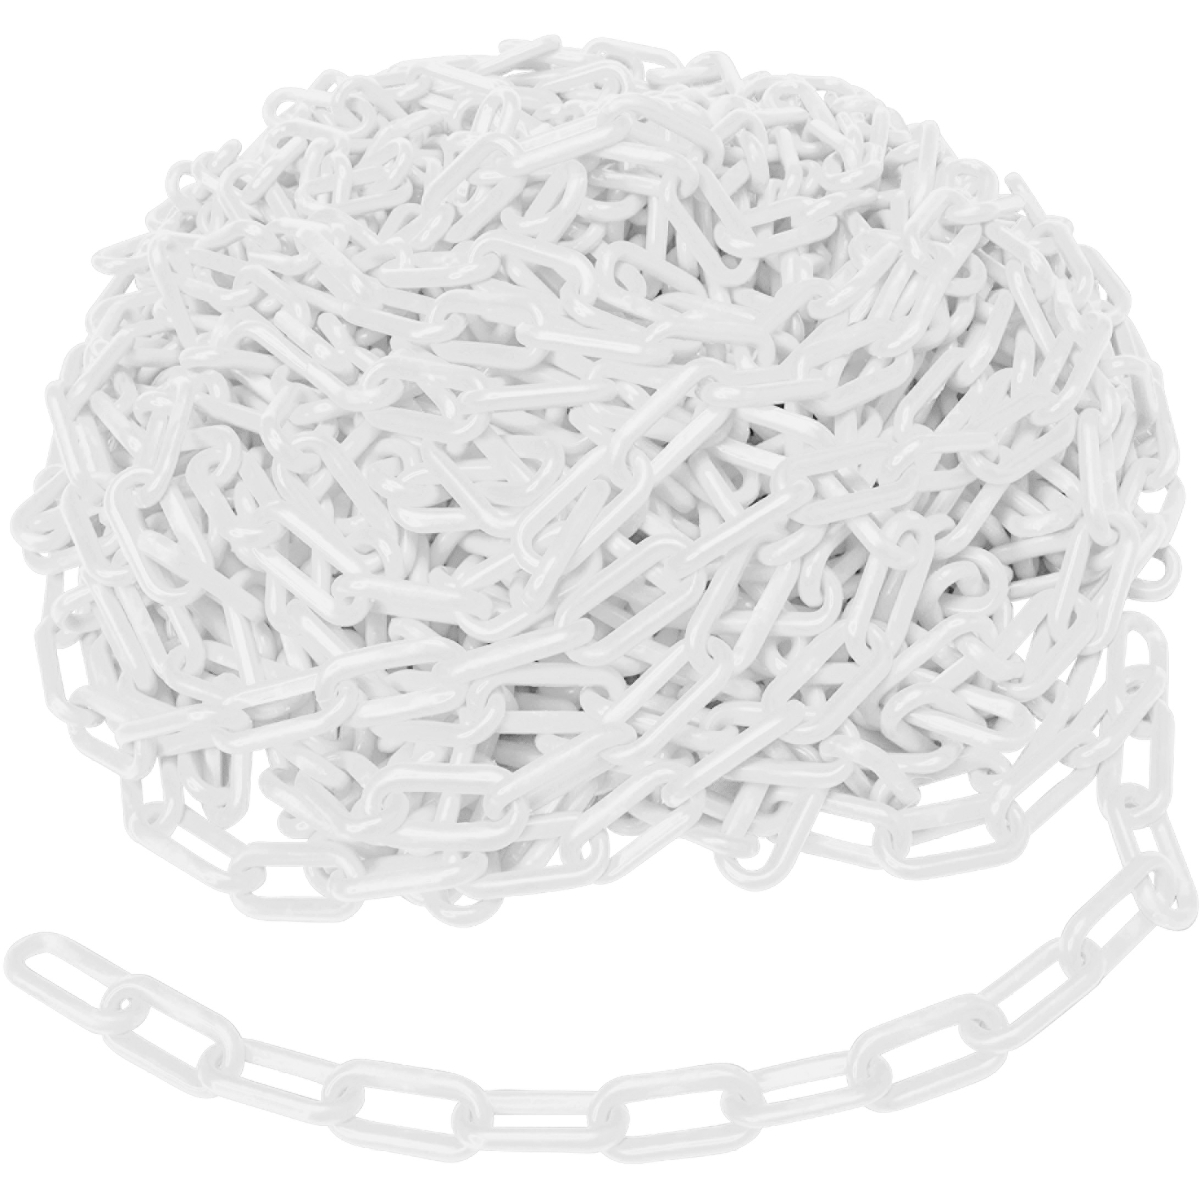 Brady® BradyLink® 78234 Warning Chain, 1-1/2 in, 100 ft L, Yellow, B-900 Polyethylene